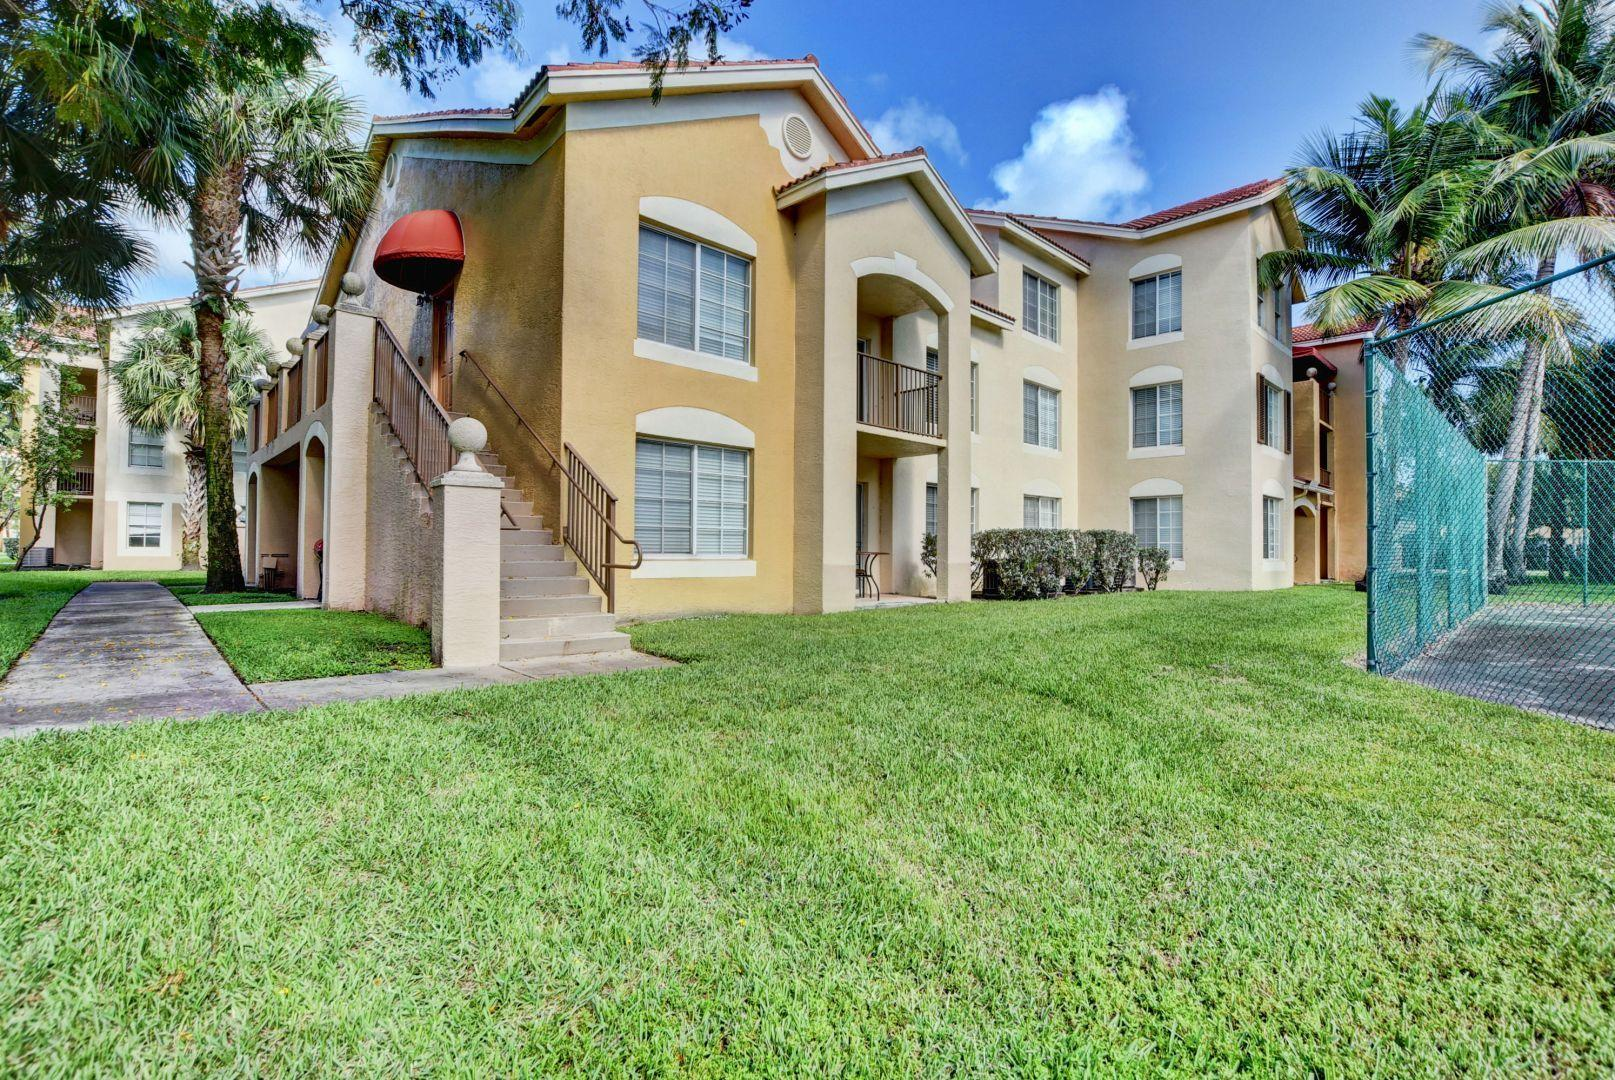 4081 San Marino Unit 208, West Palm Beach, Florida 33409